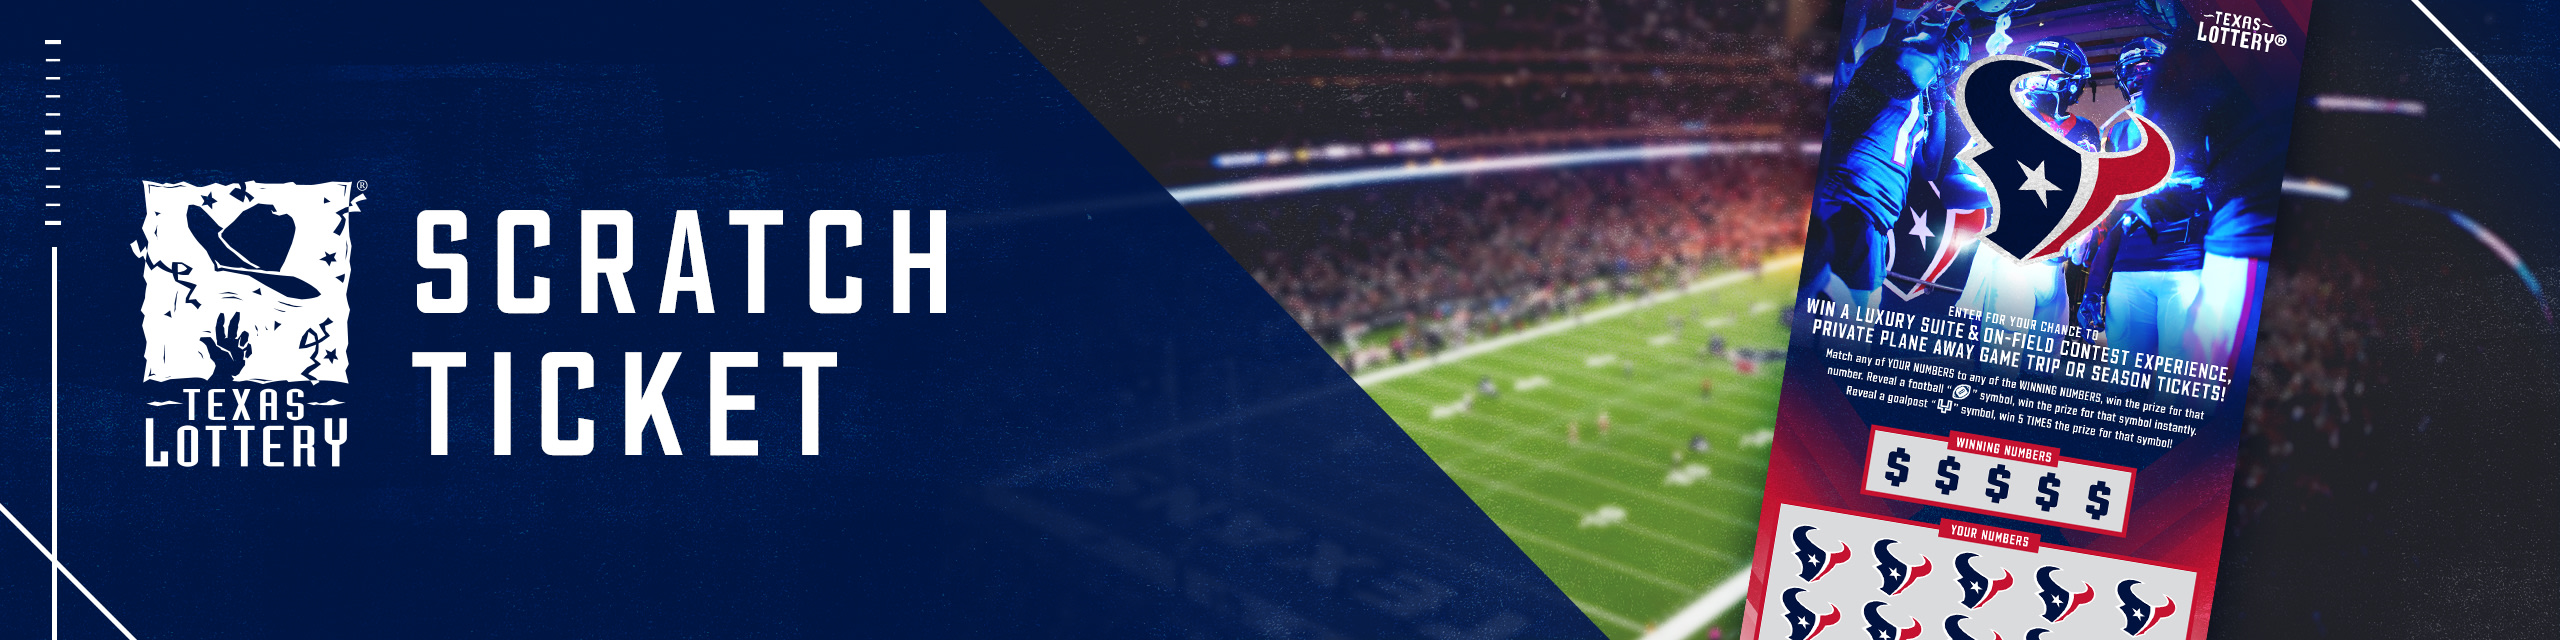 Texas Lottery | Houston Texans - HoustonTexans com